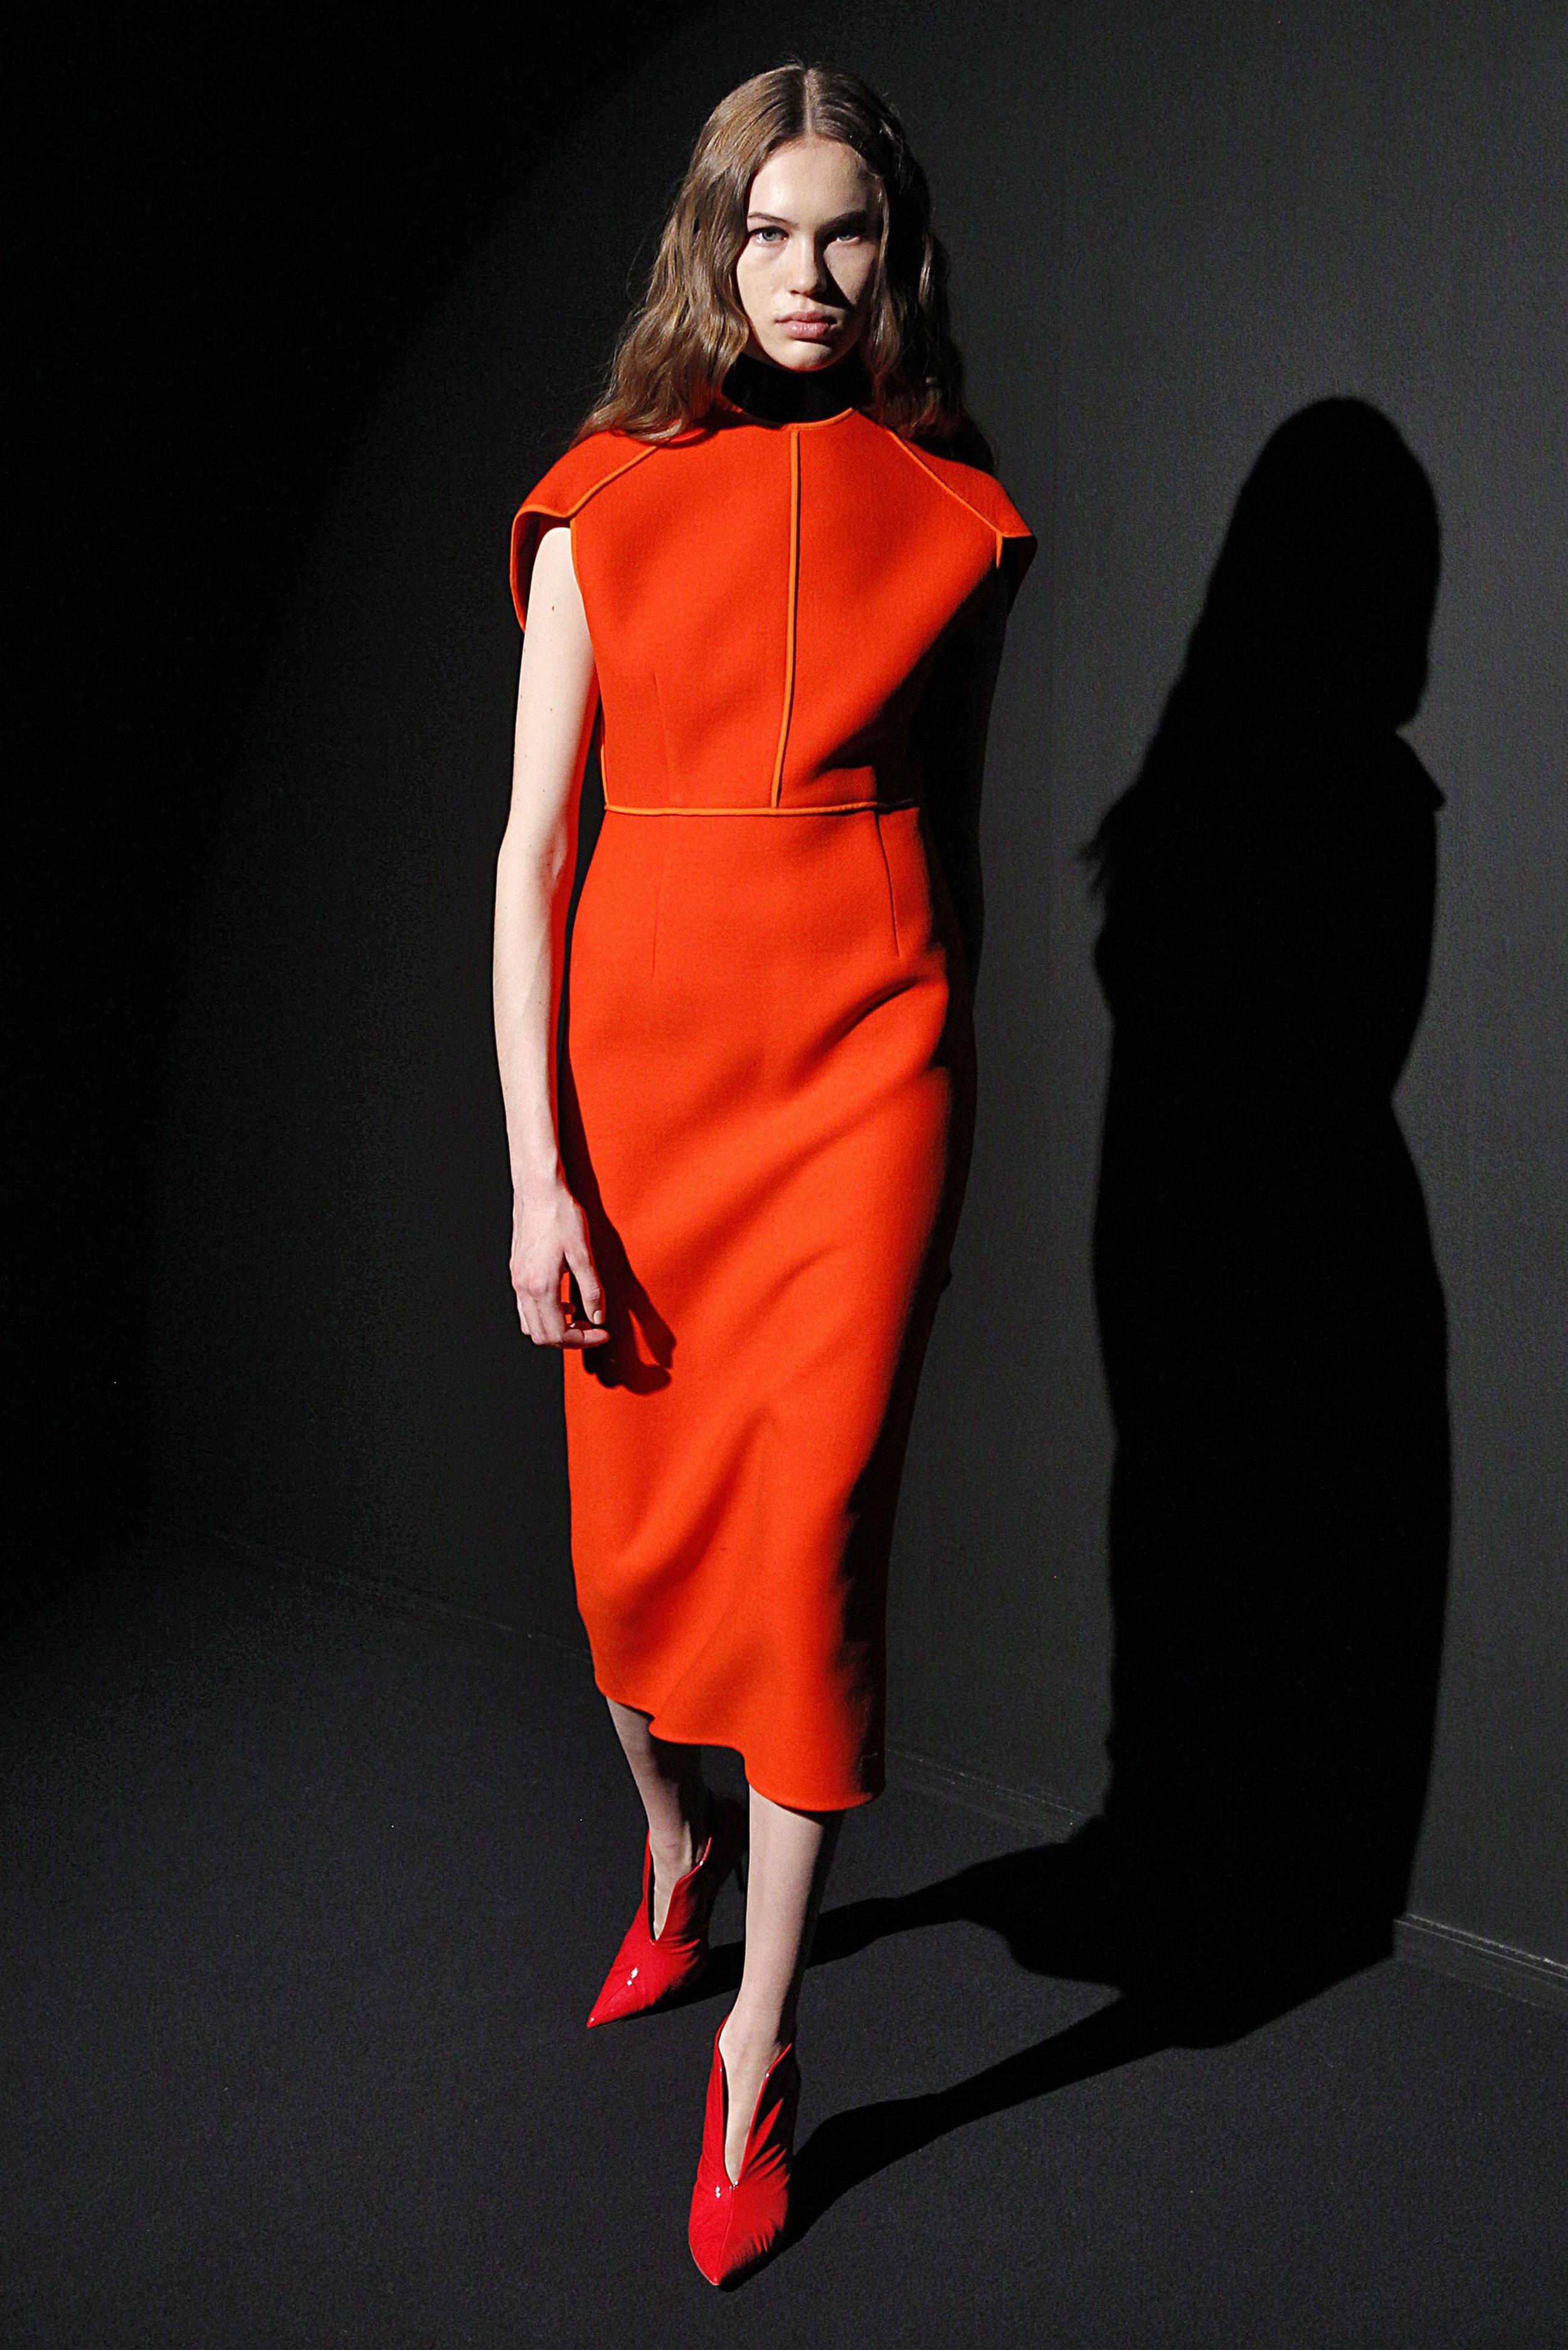 Look 8 Red wool dress over black sleeveless turtleneck.